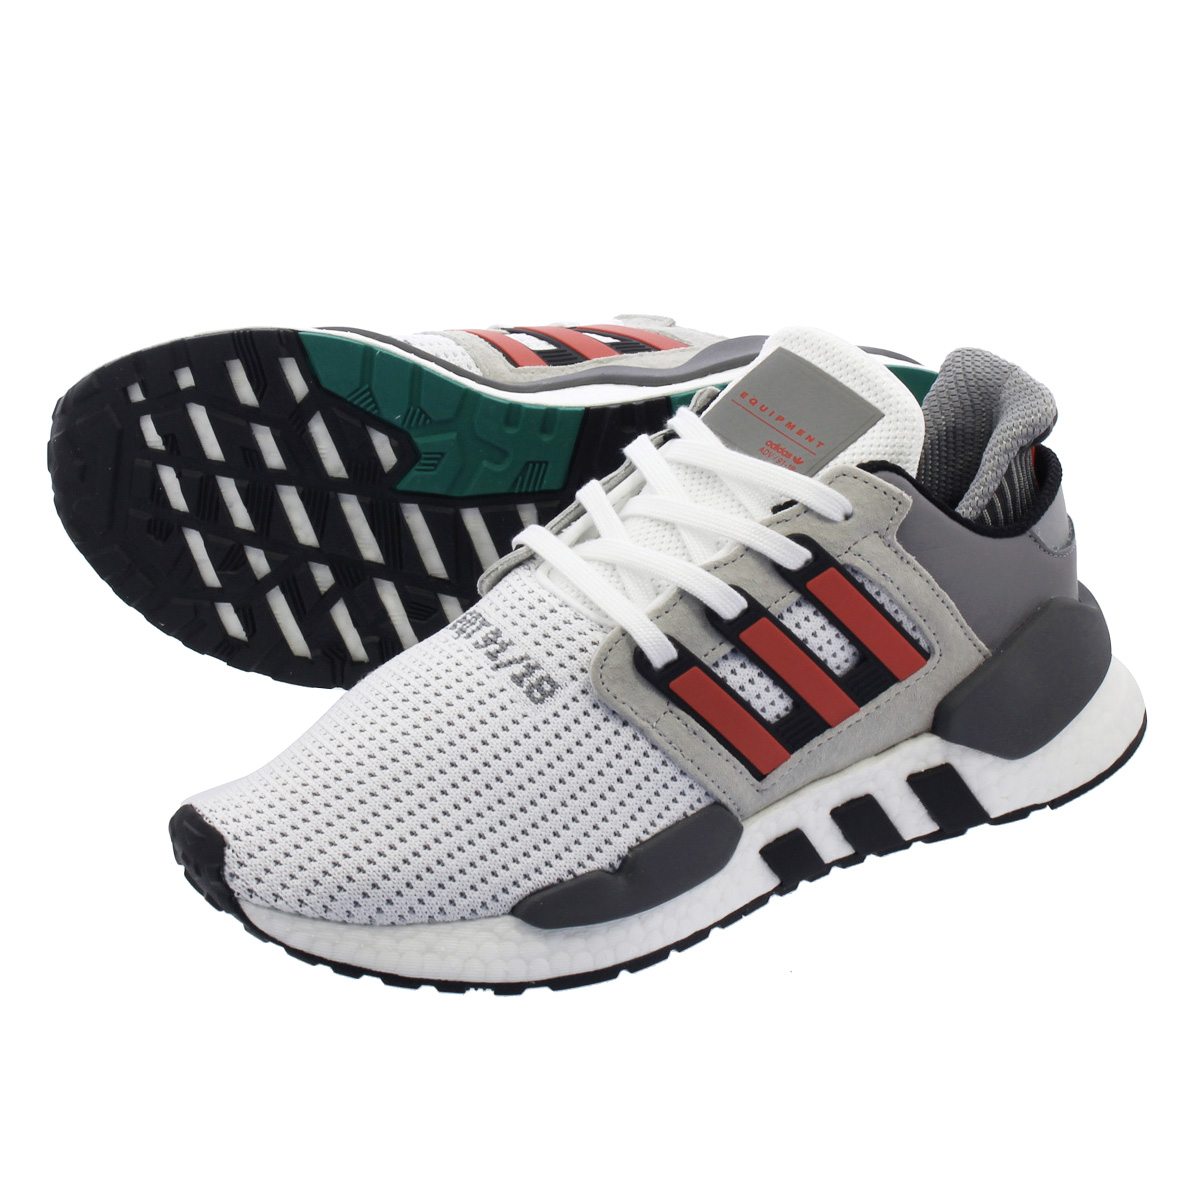 adidas EQT SUPPORT 91/18 アディダス EQT サポート 91/18 RUNNING WHITE/HI-RES RED/GREY ONE b37521